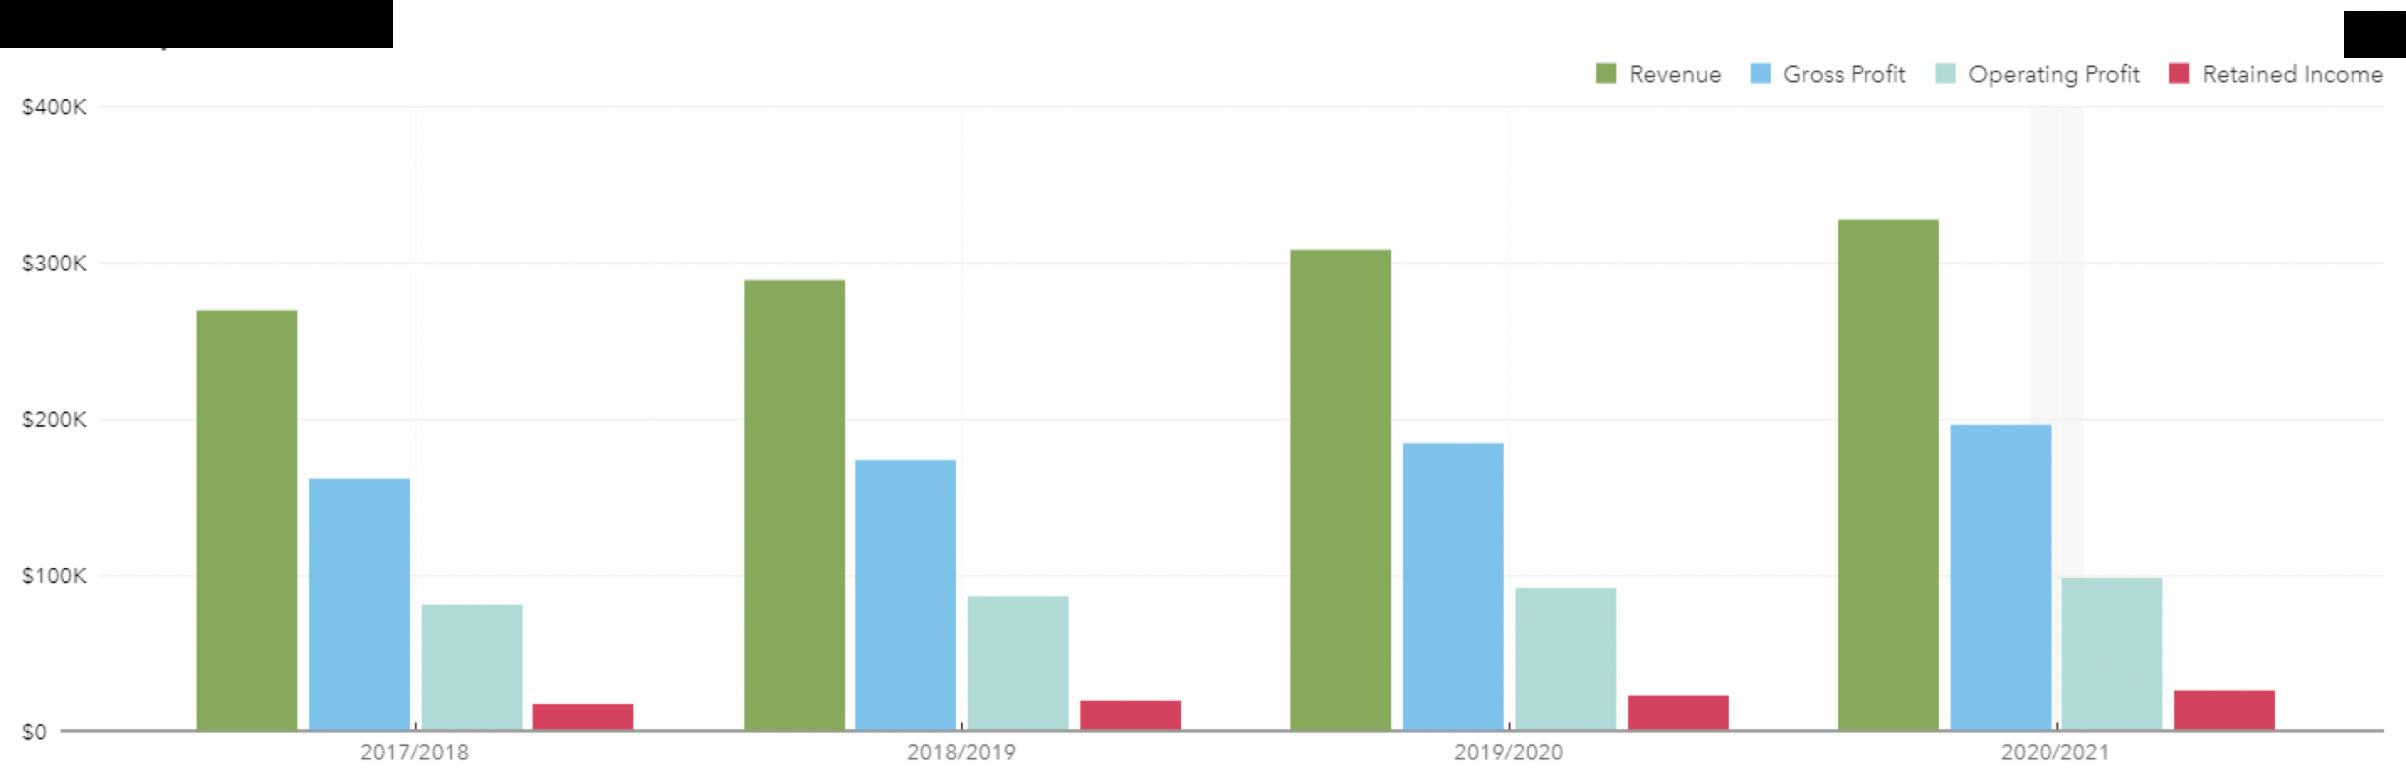 Chart-4-Year-on-Year-Profitability